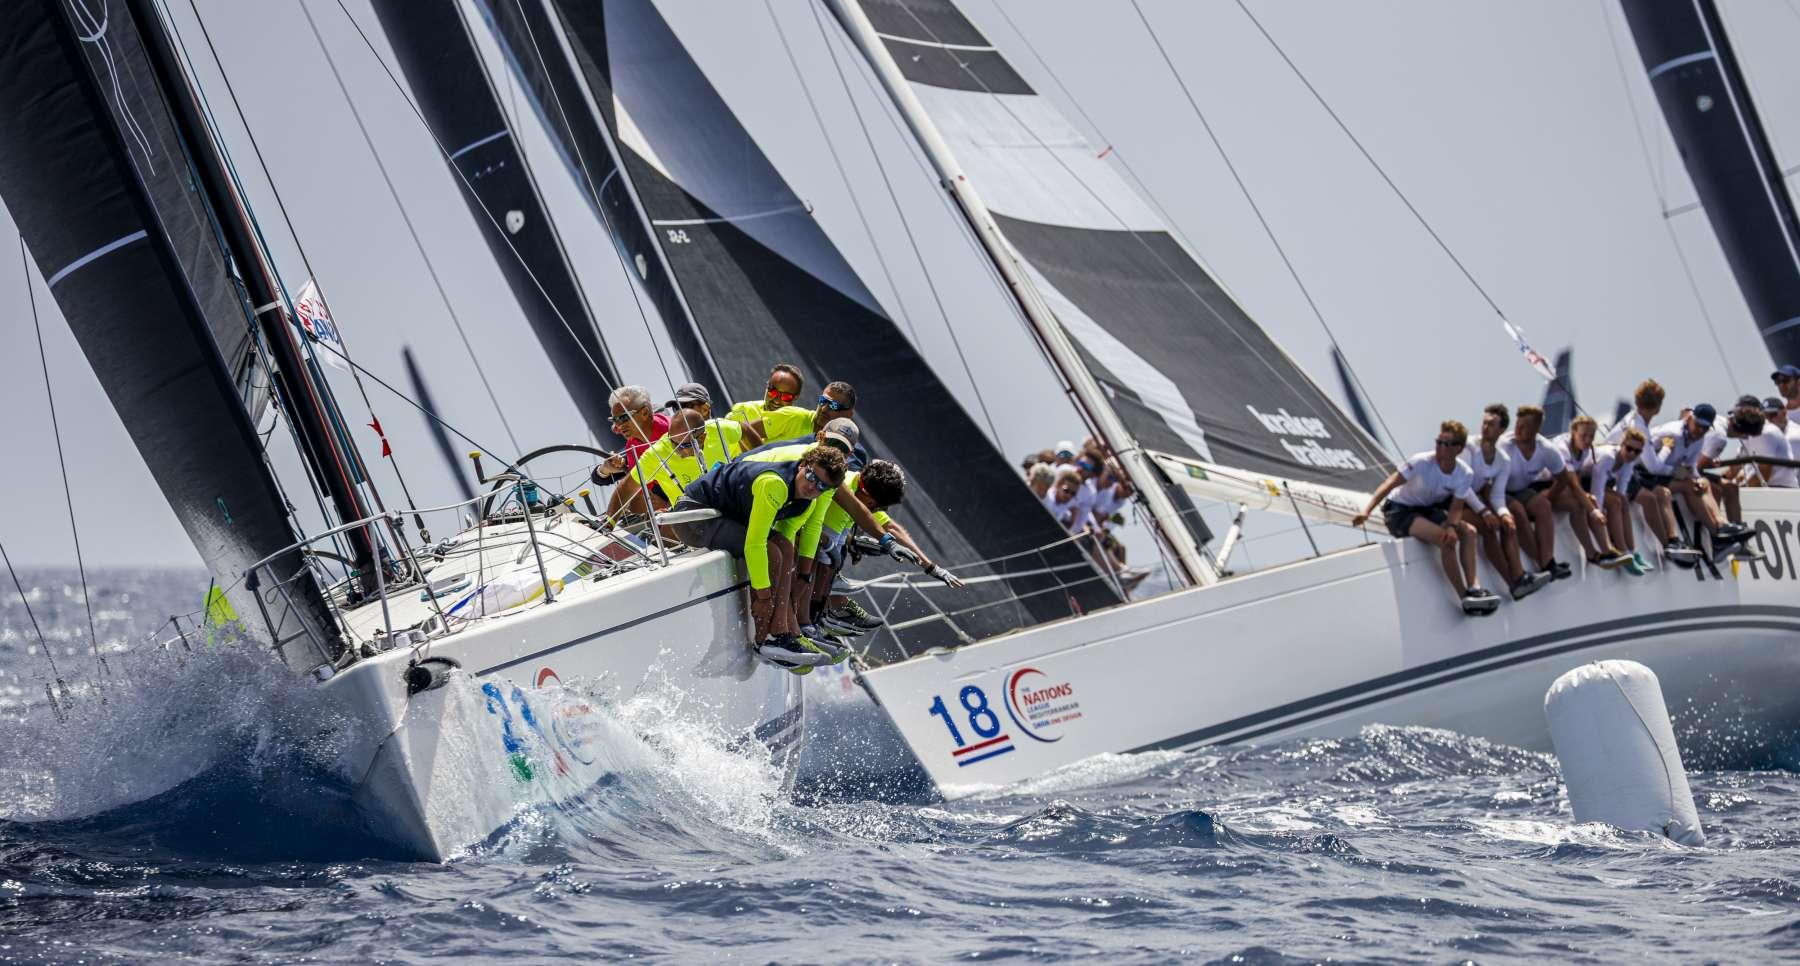 Il Maestrale soffia sulla Swan Sardinia Challenge - NEWS - Yacht Club Costa Smeralda